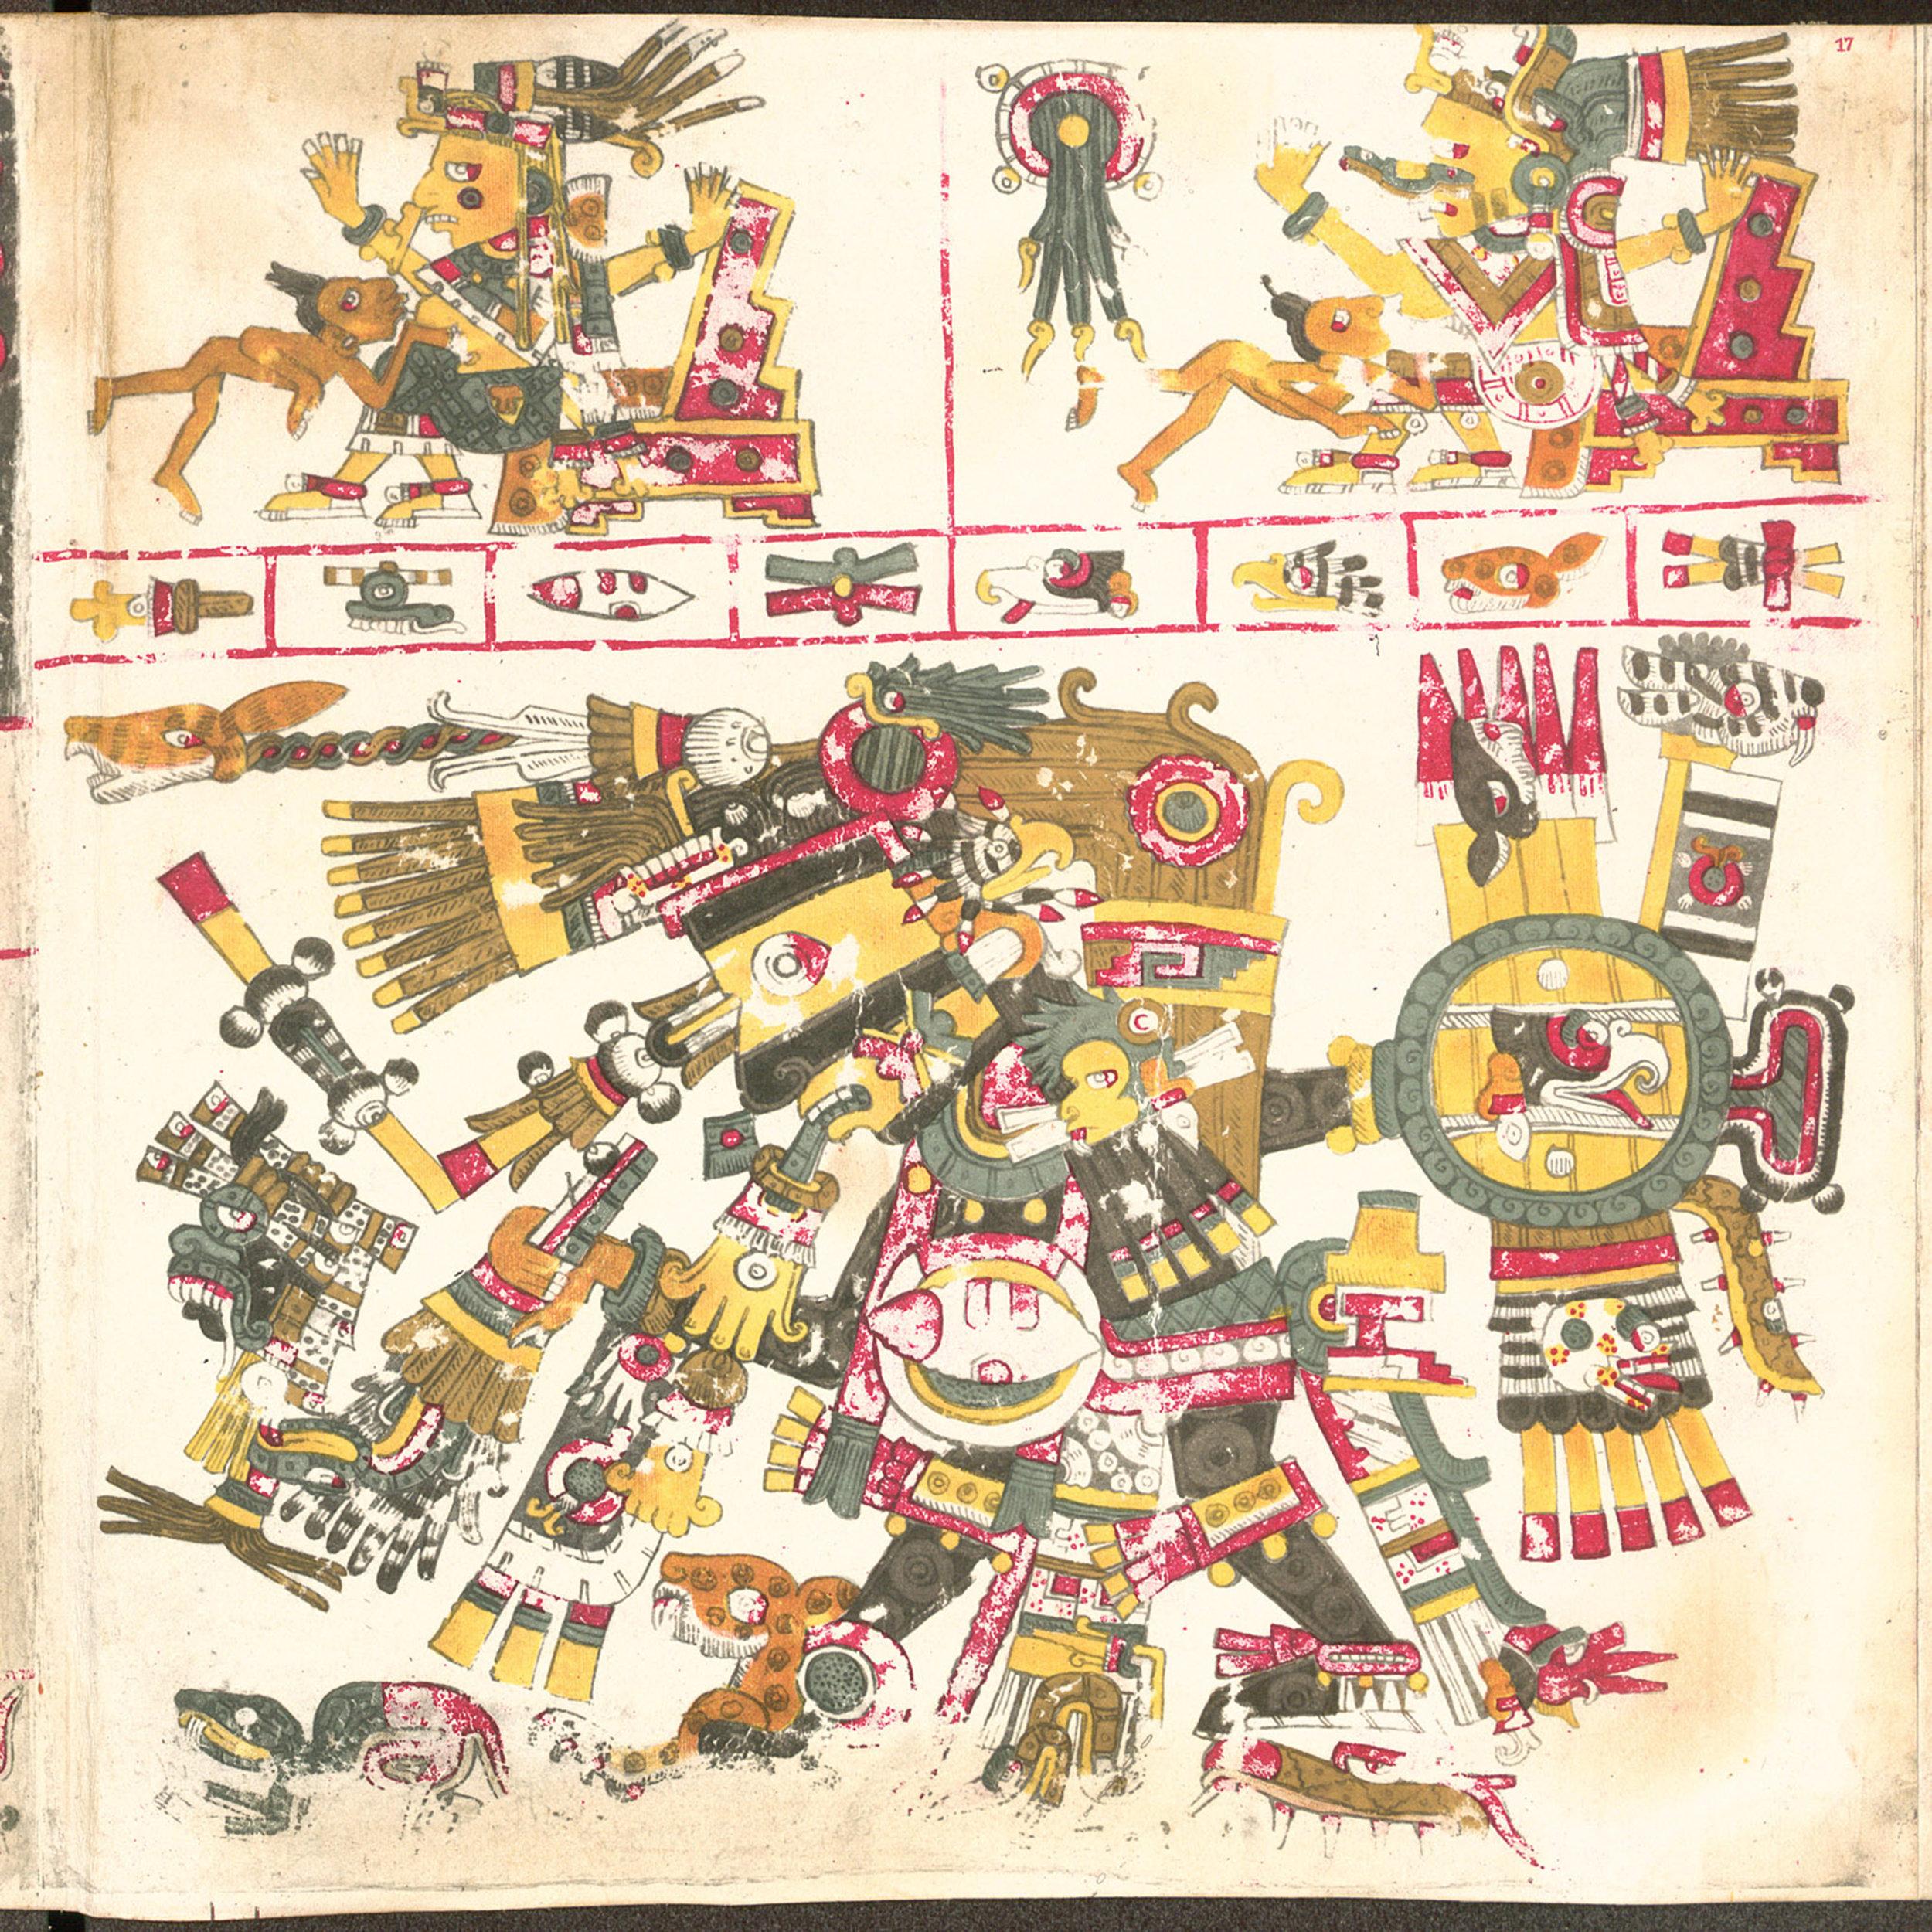 01_Codex_Borgia_pag_17.jpg